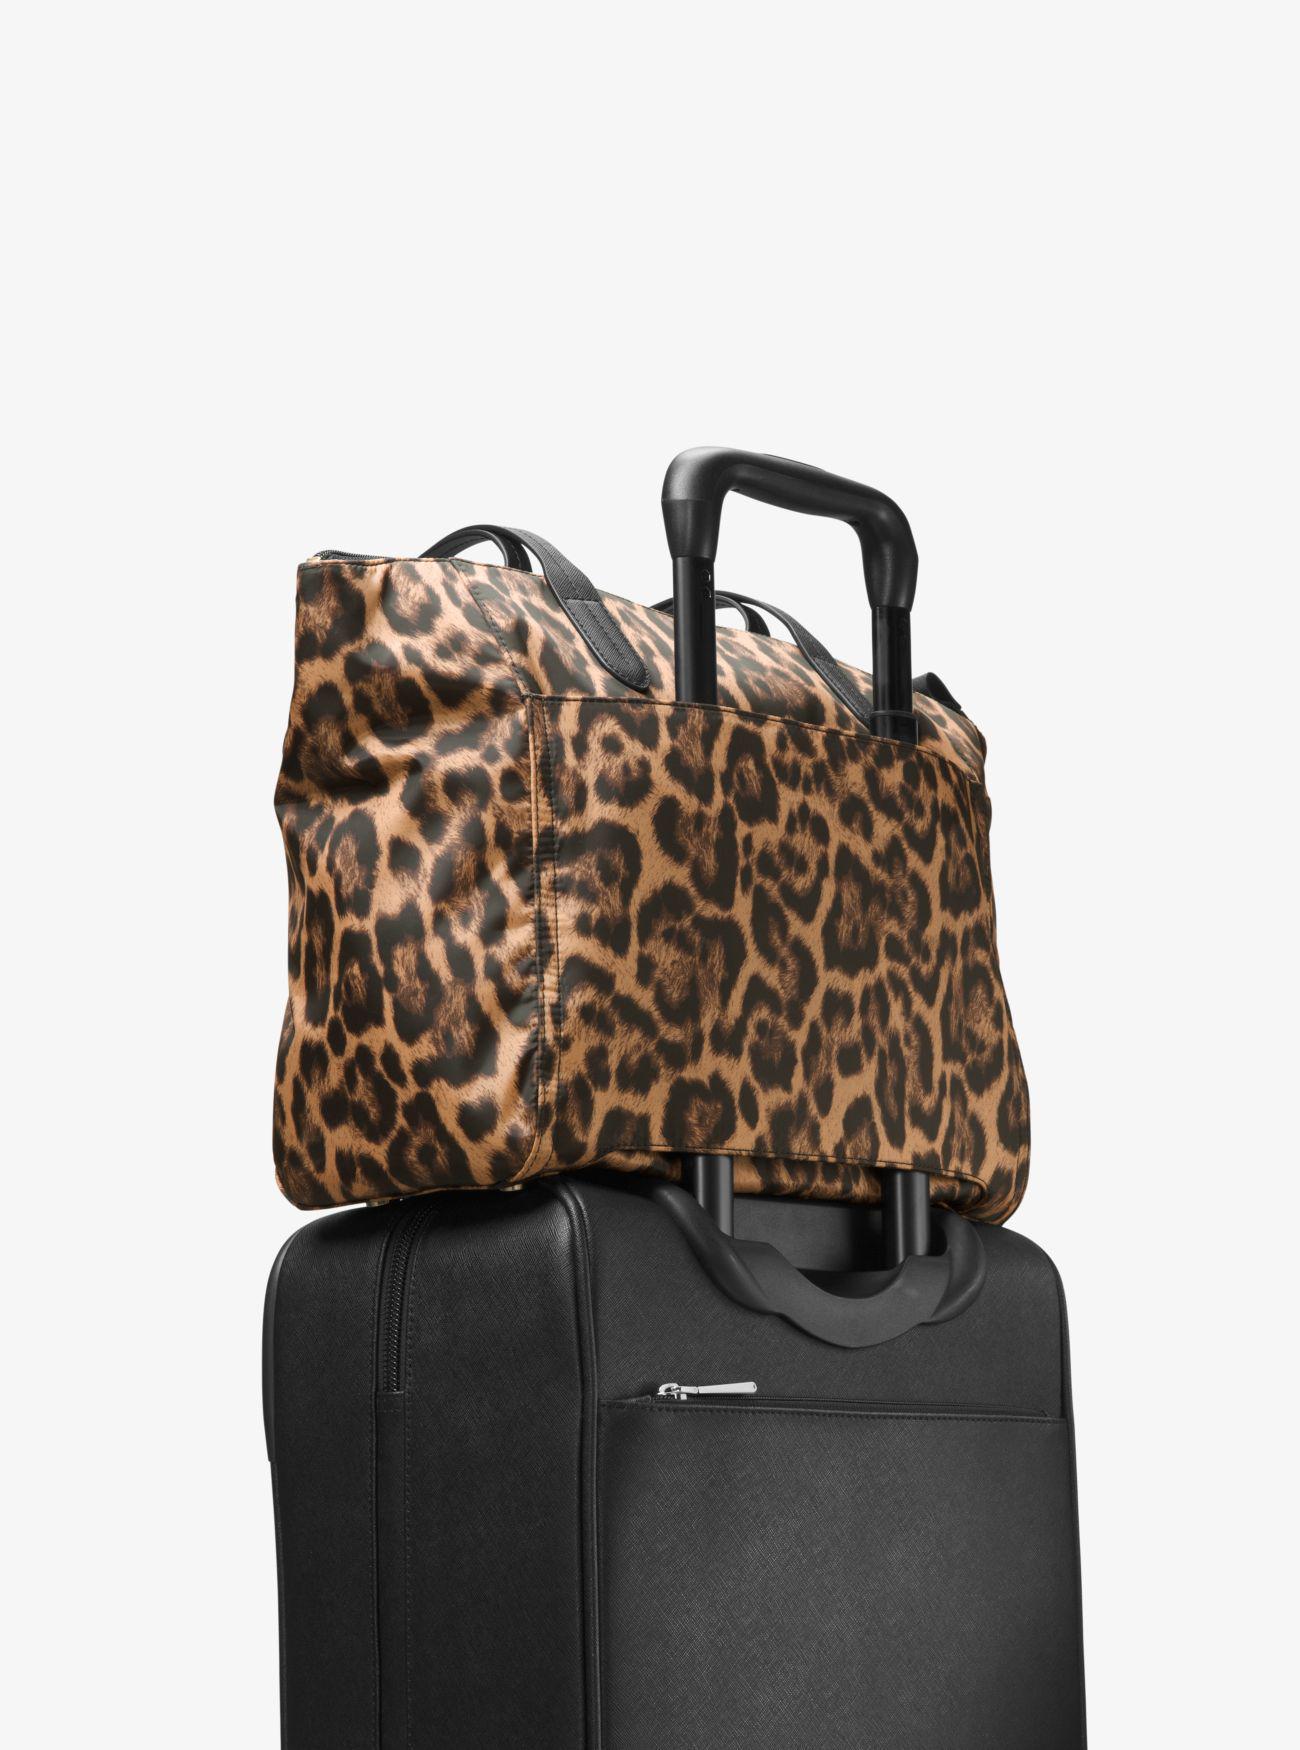 8505425dc0e45 Lyst - Michael Kors Kelsey Leopard Nylon Tote